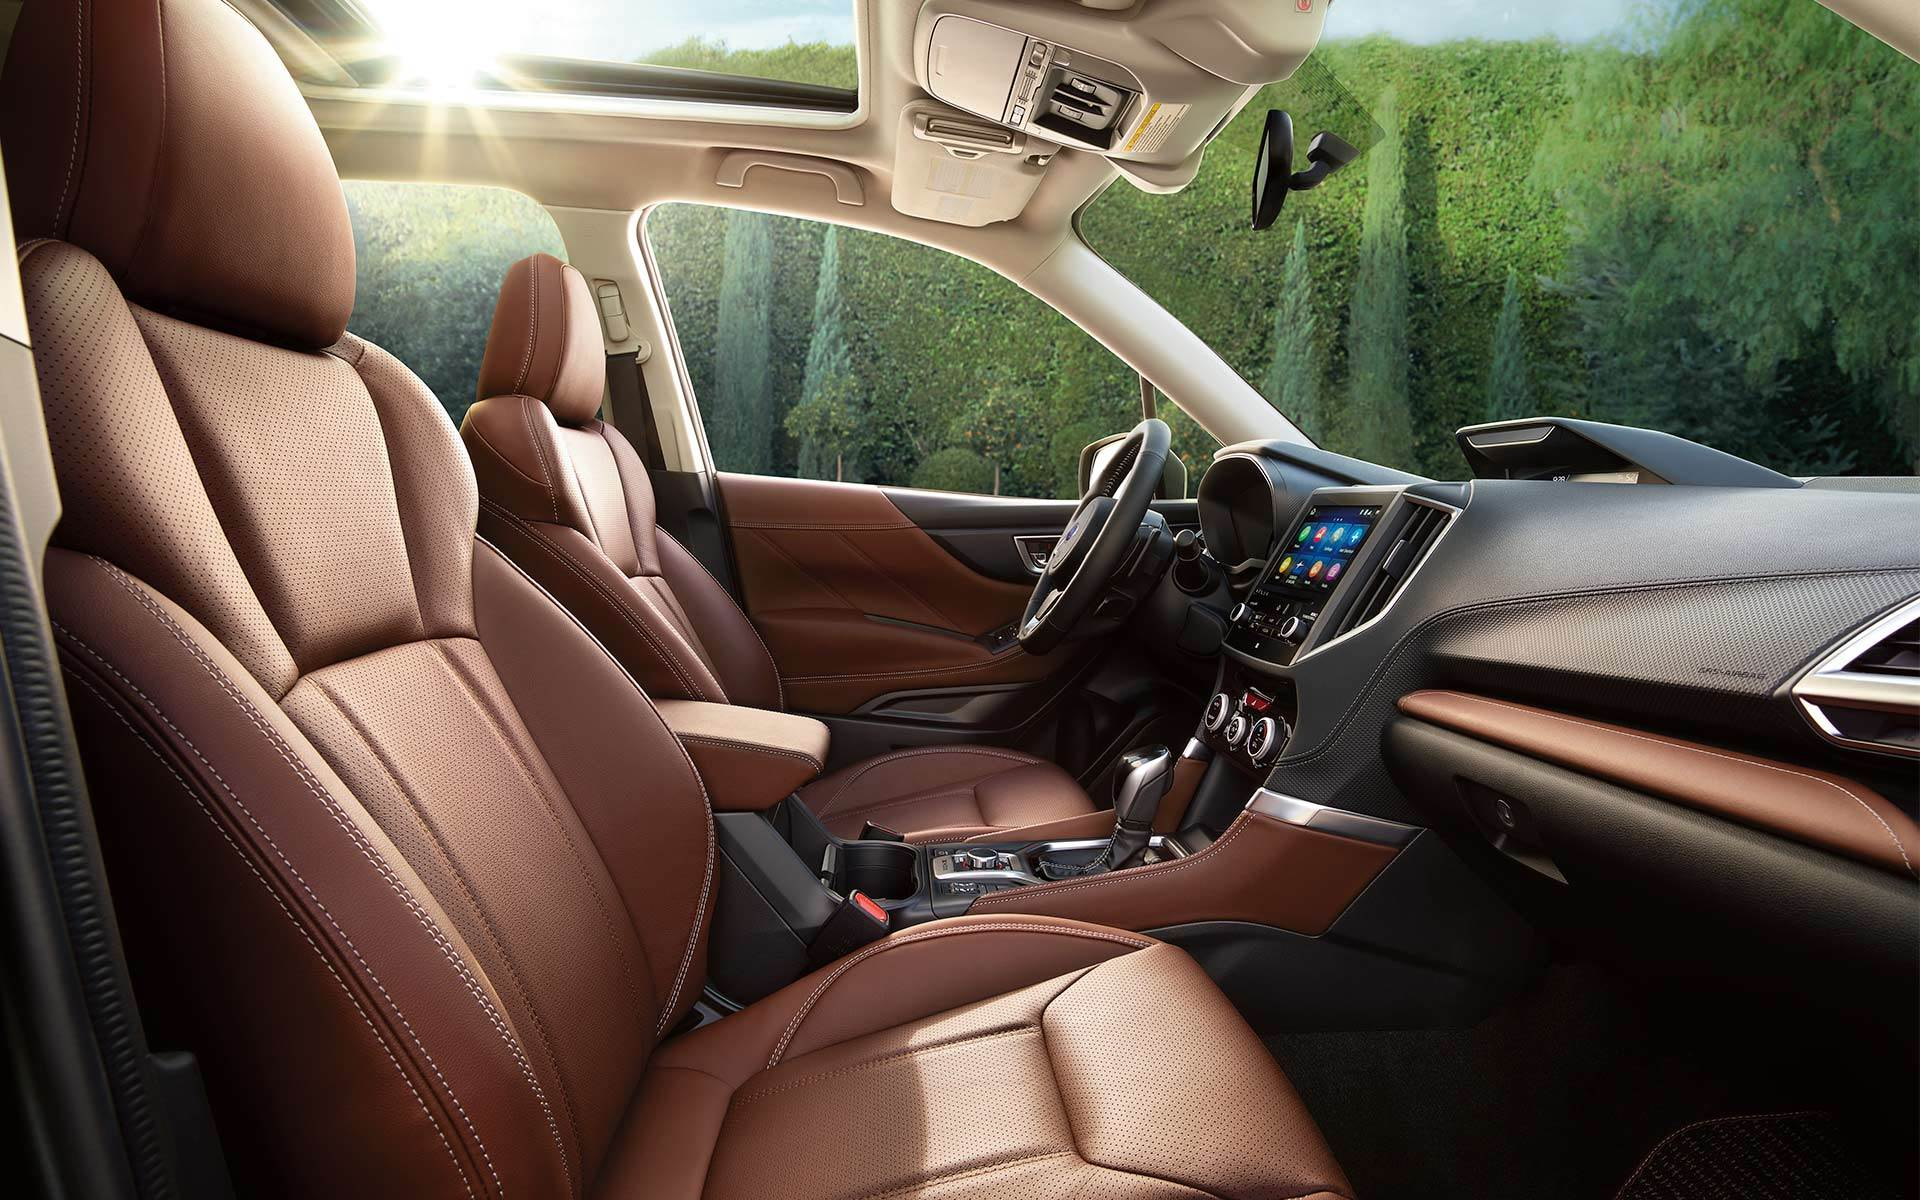 2021 Subaru Forester Ramsey NJ